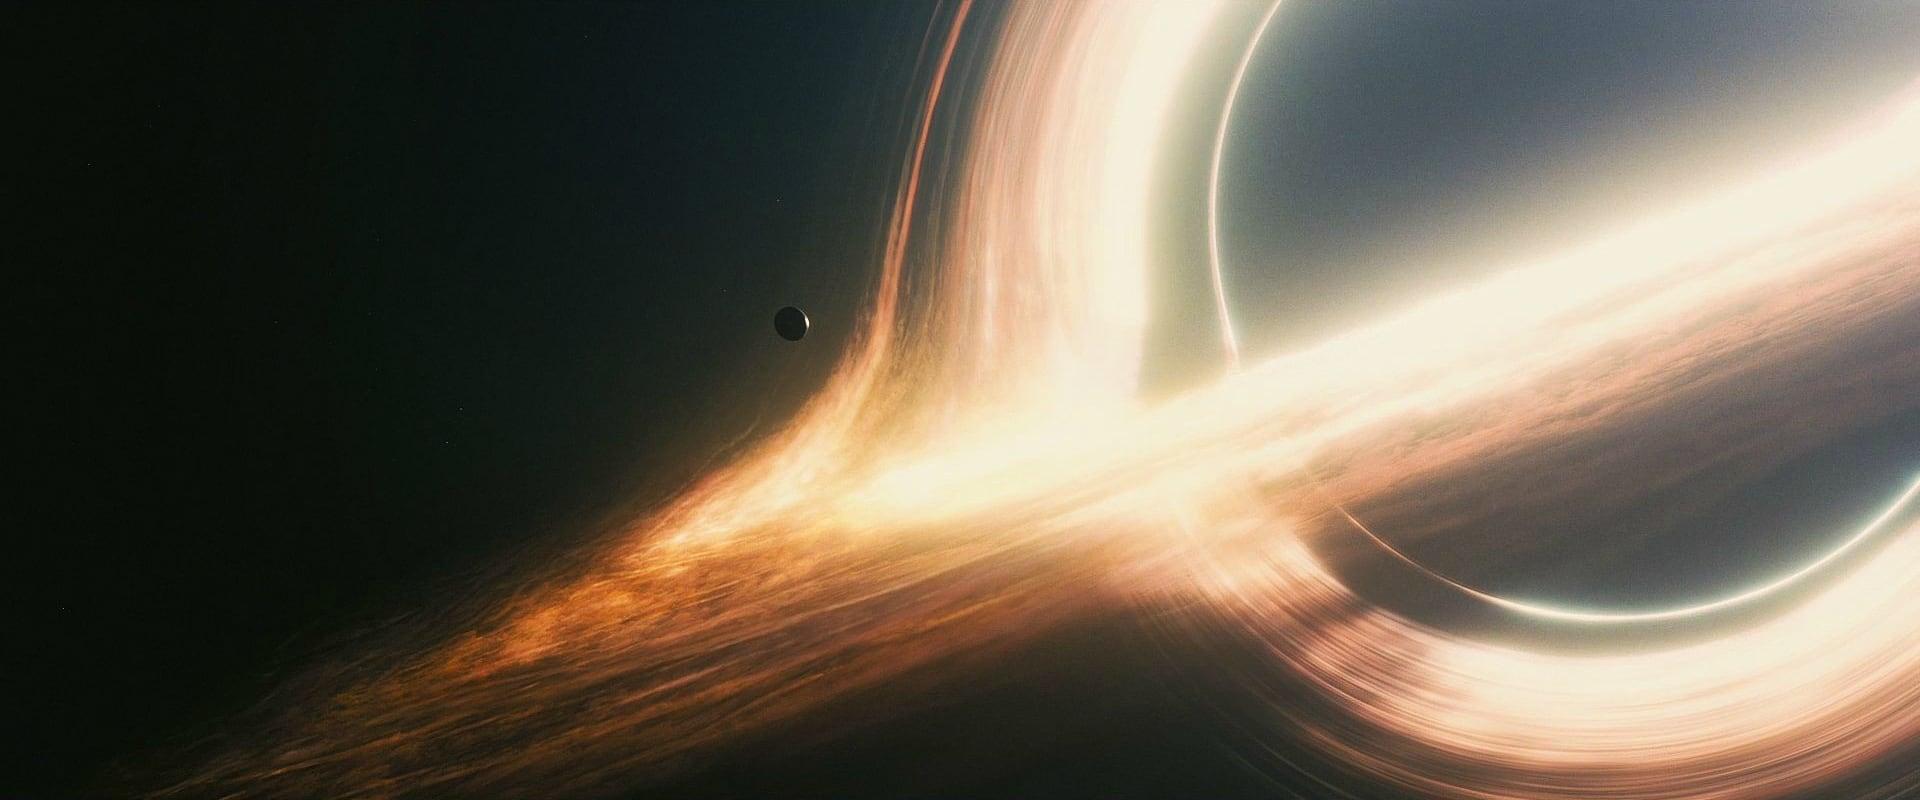 Interstellar black hole